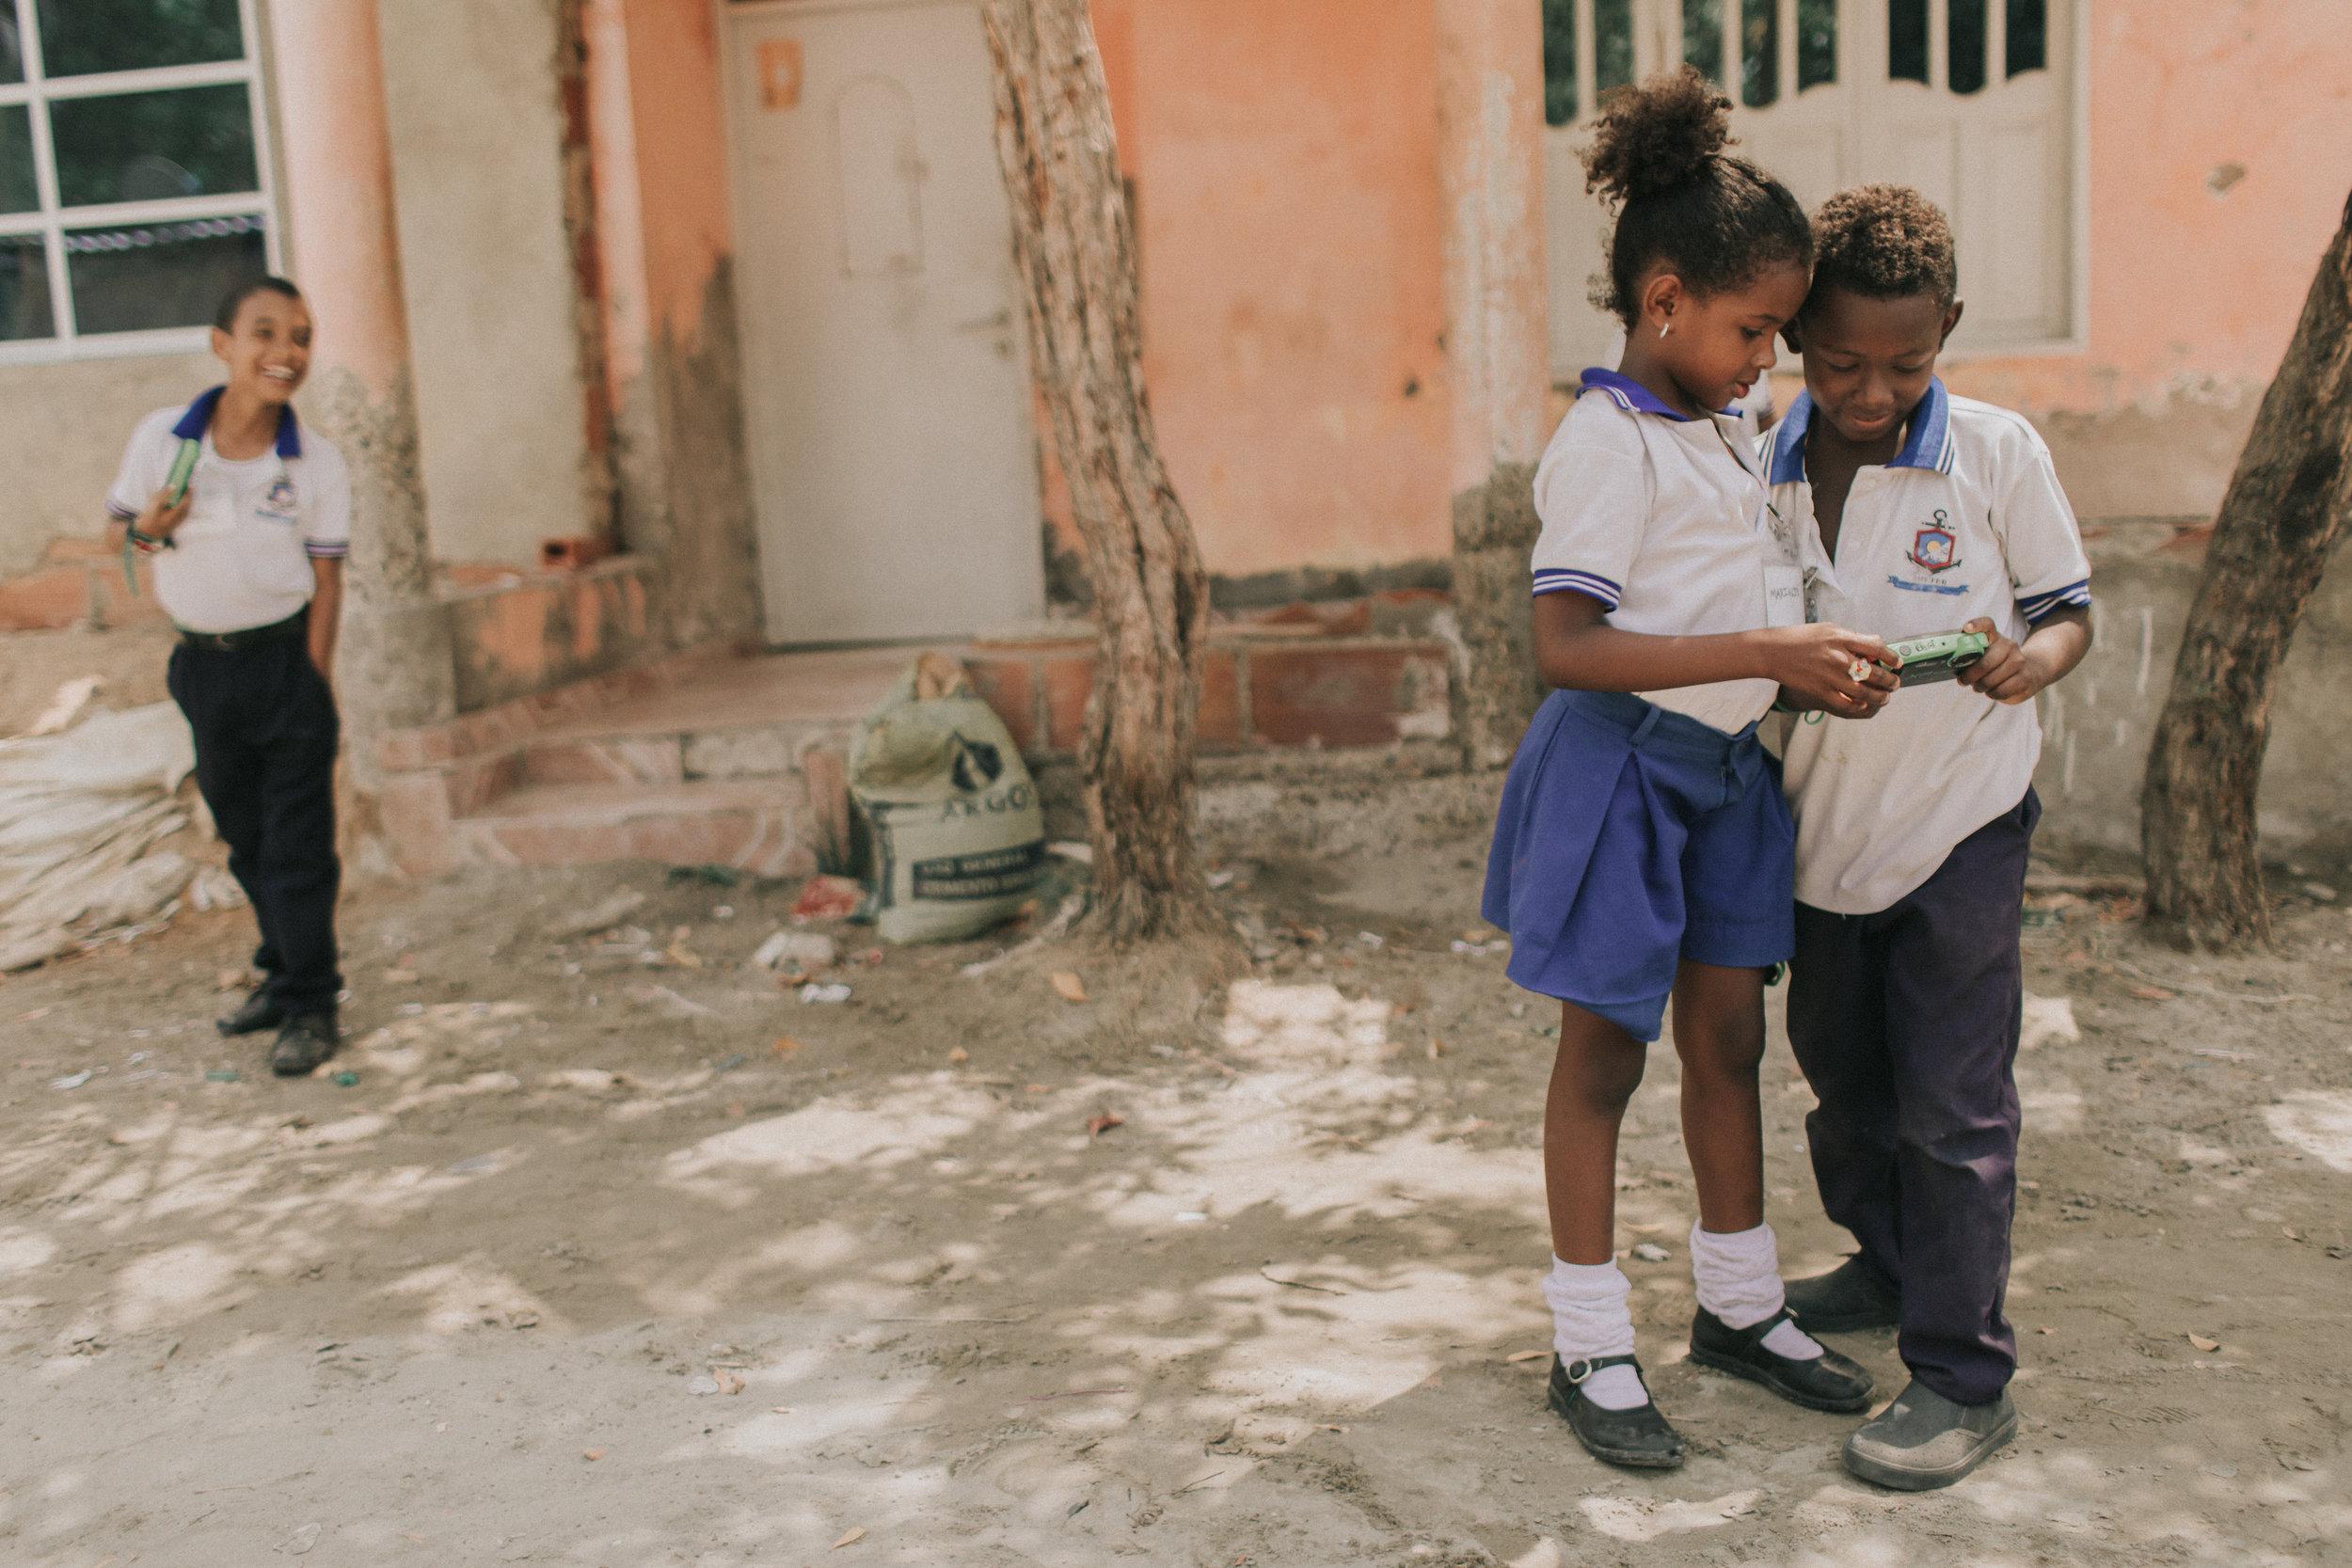 ORGANIZATIONS - Schools + Community Centers + Children's Homes